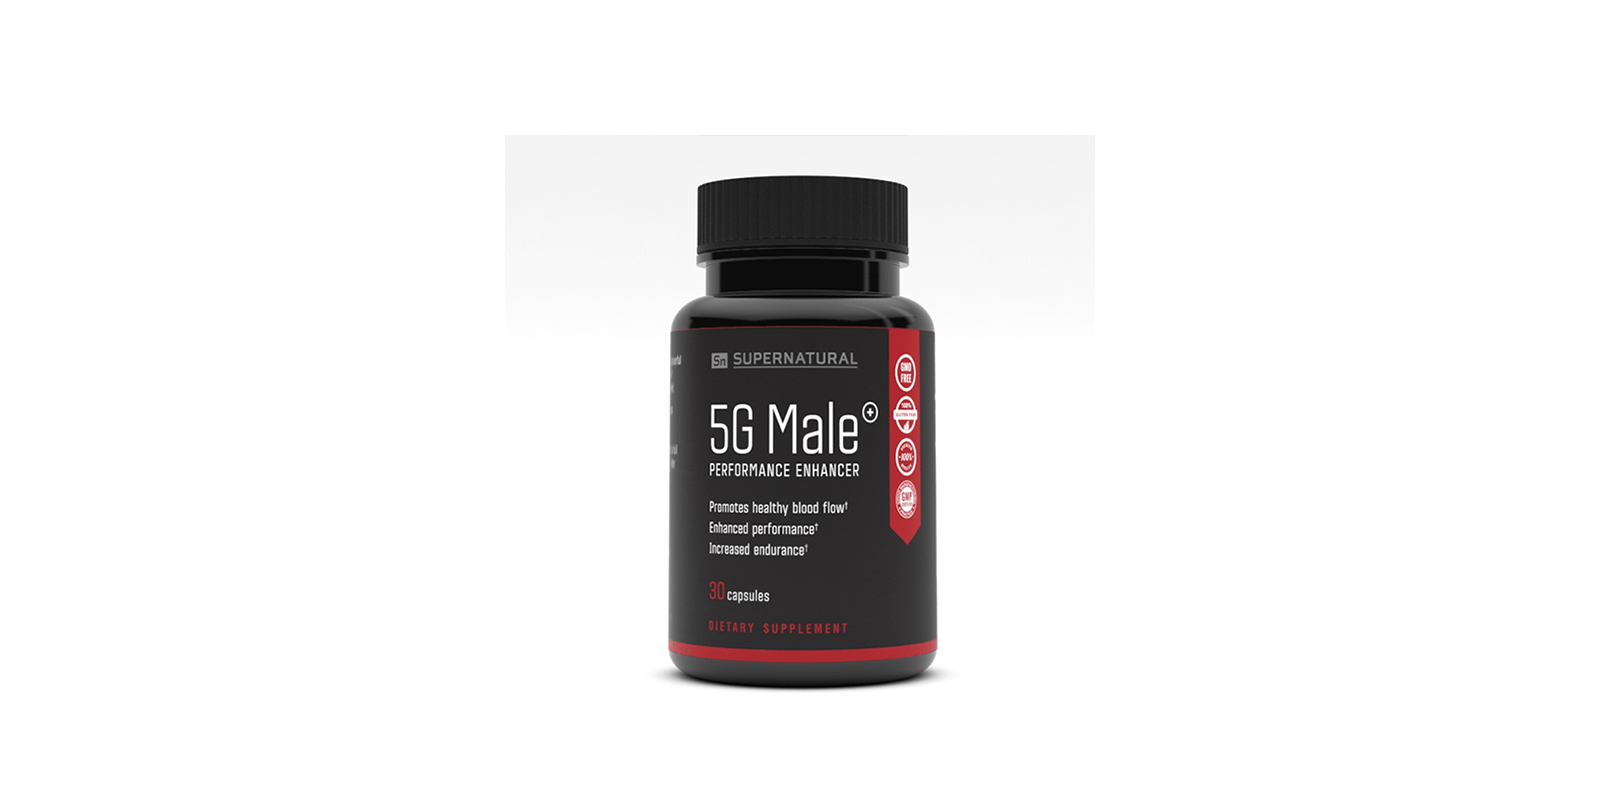 5g Male Performance Enhancer reviews